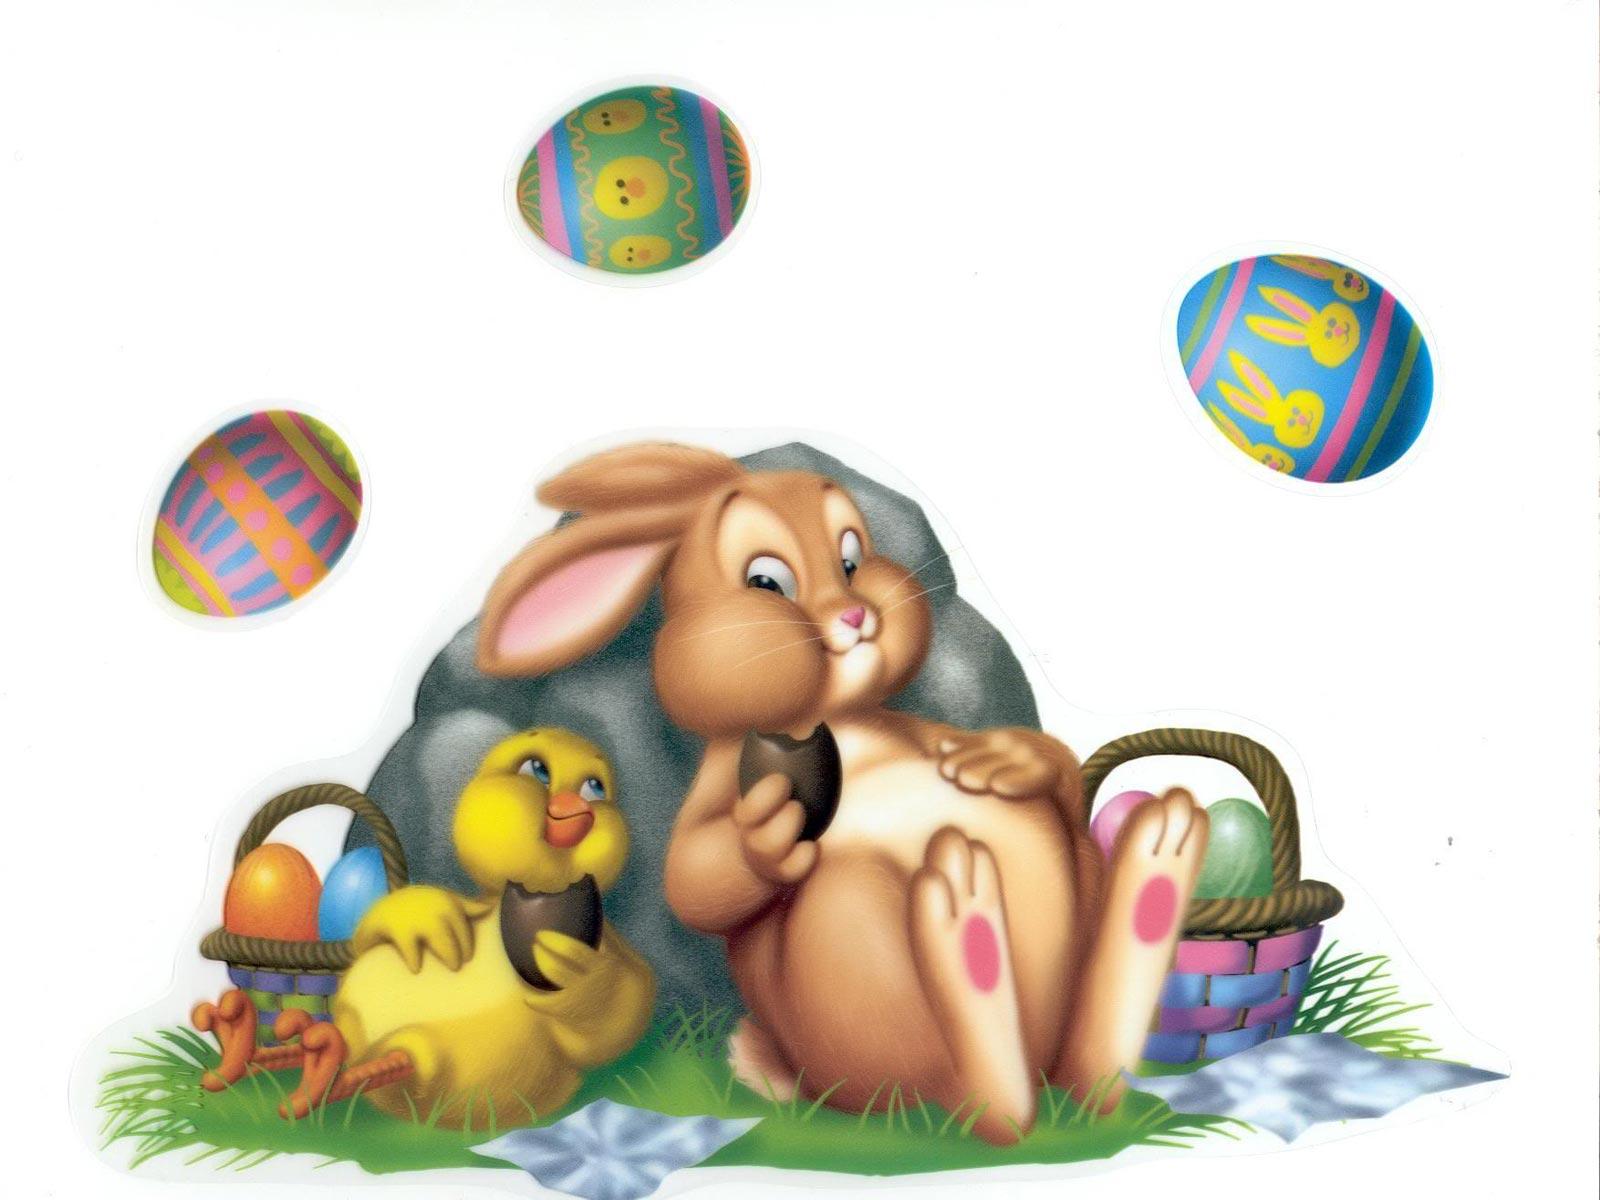 Beautiful Wallpapers For Desktop Happy Easter wallpapers 1600x1200